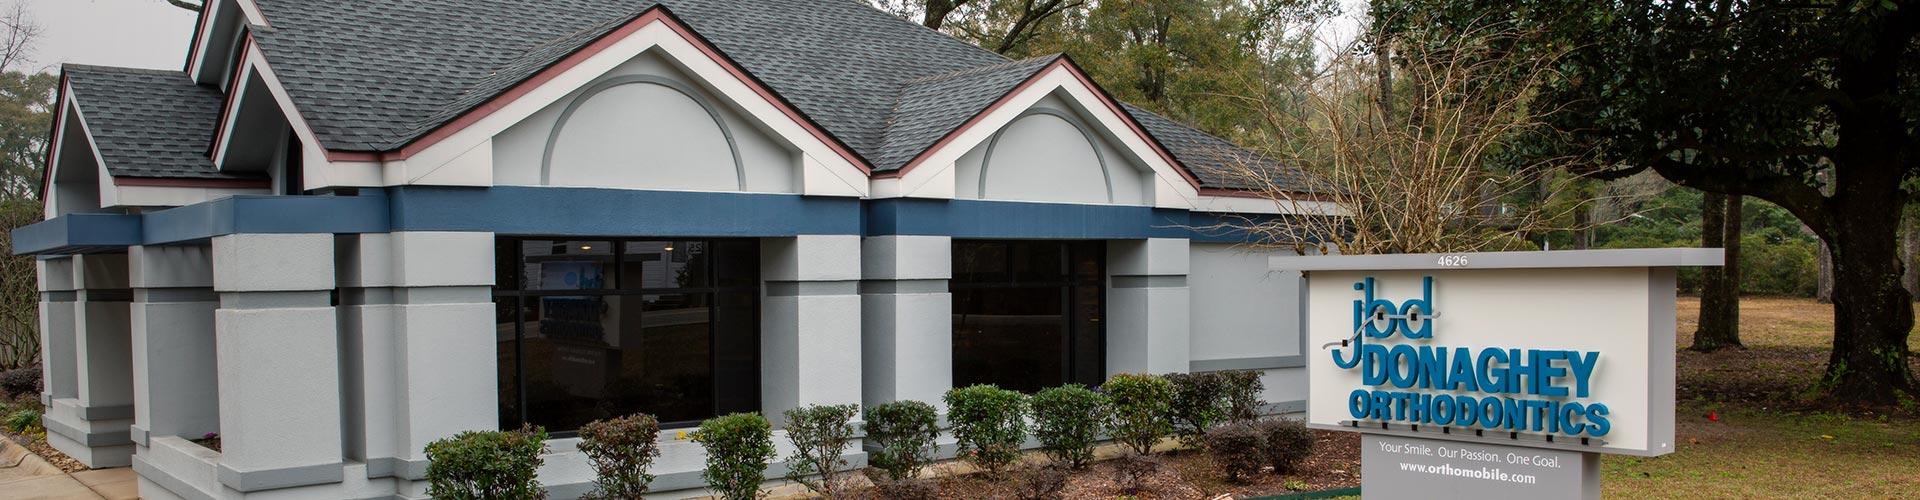 Office Building Donaghey Orthodontics Mobile Chatom AL